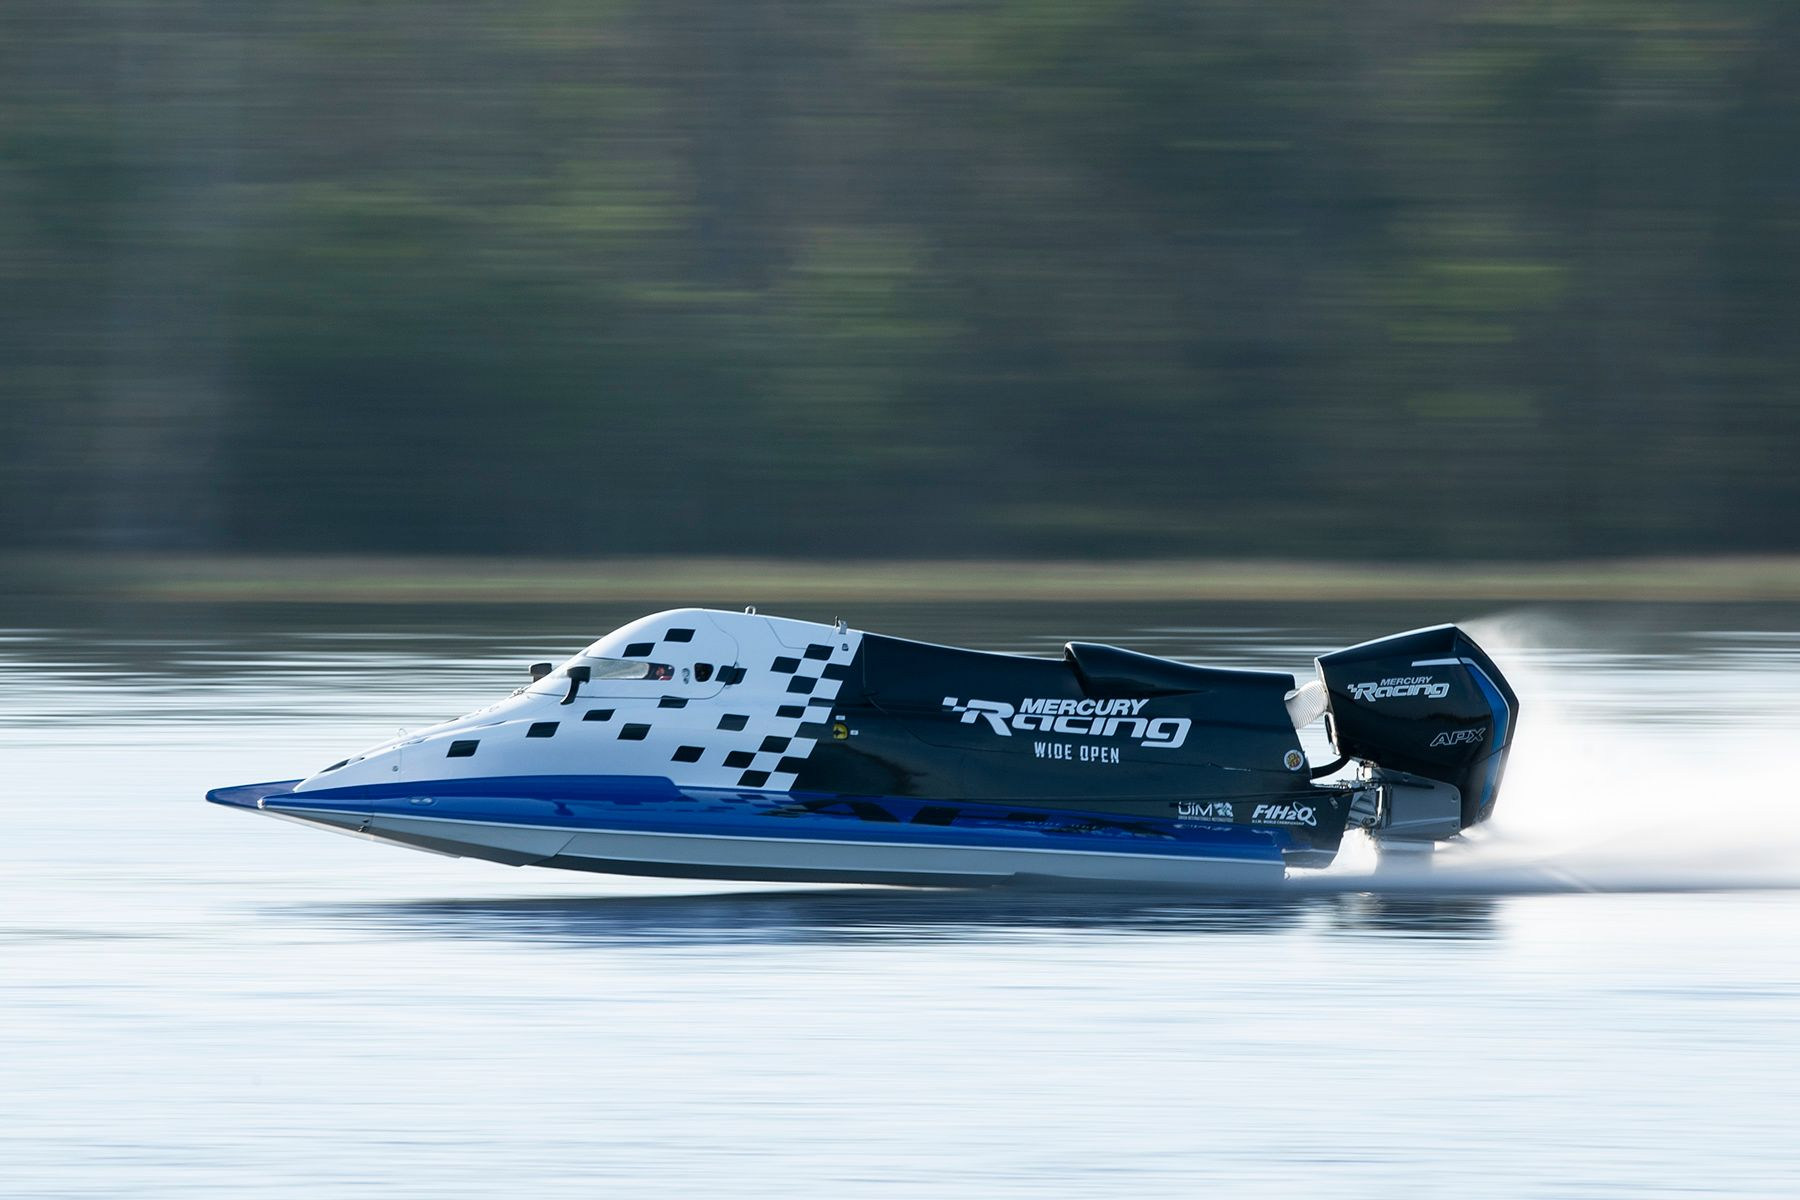 Client: Mercury Racing